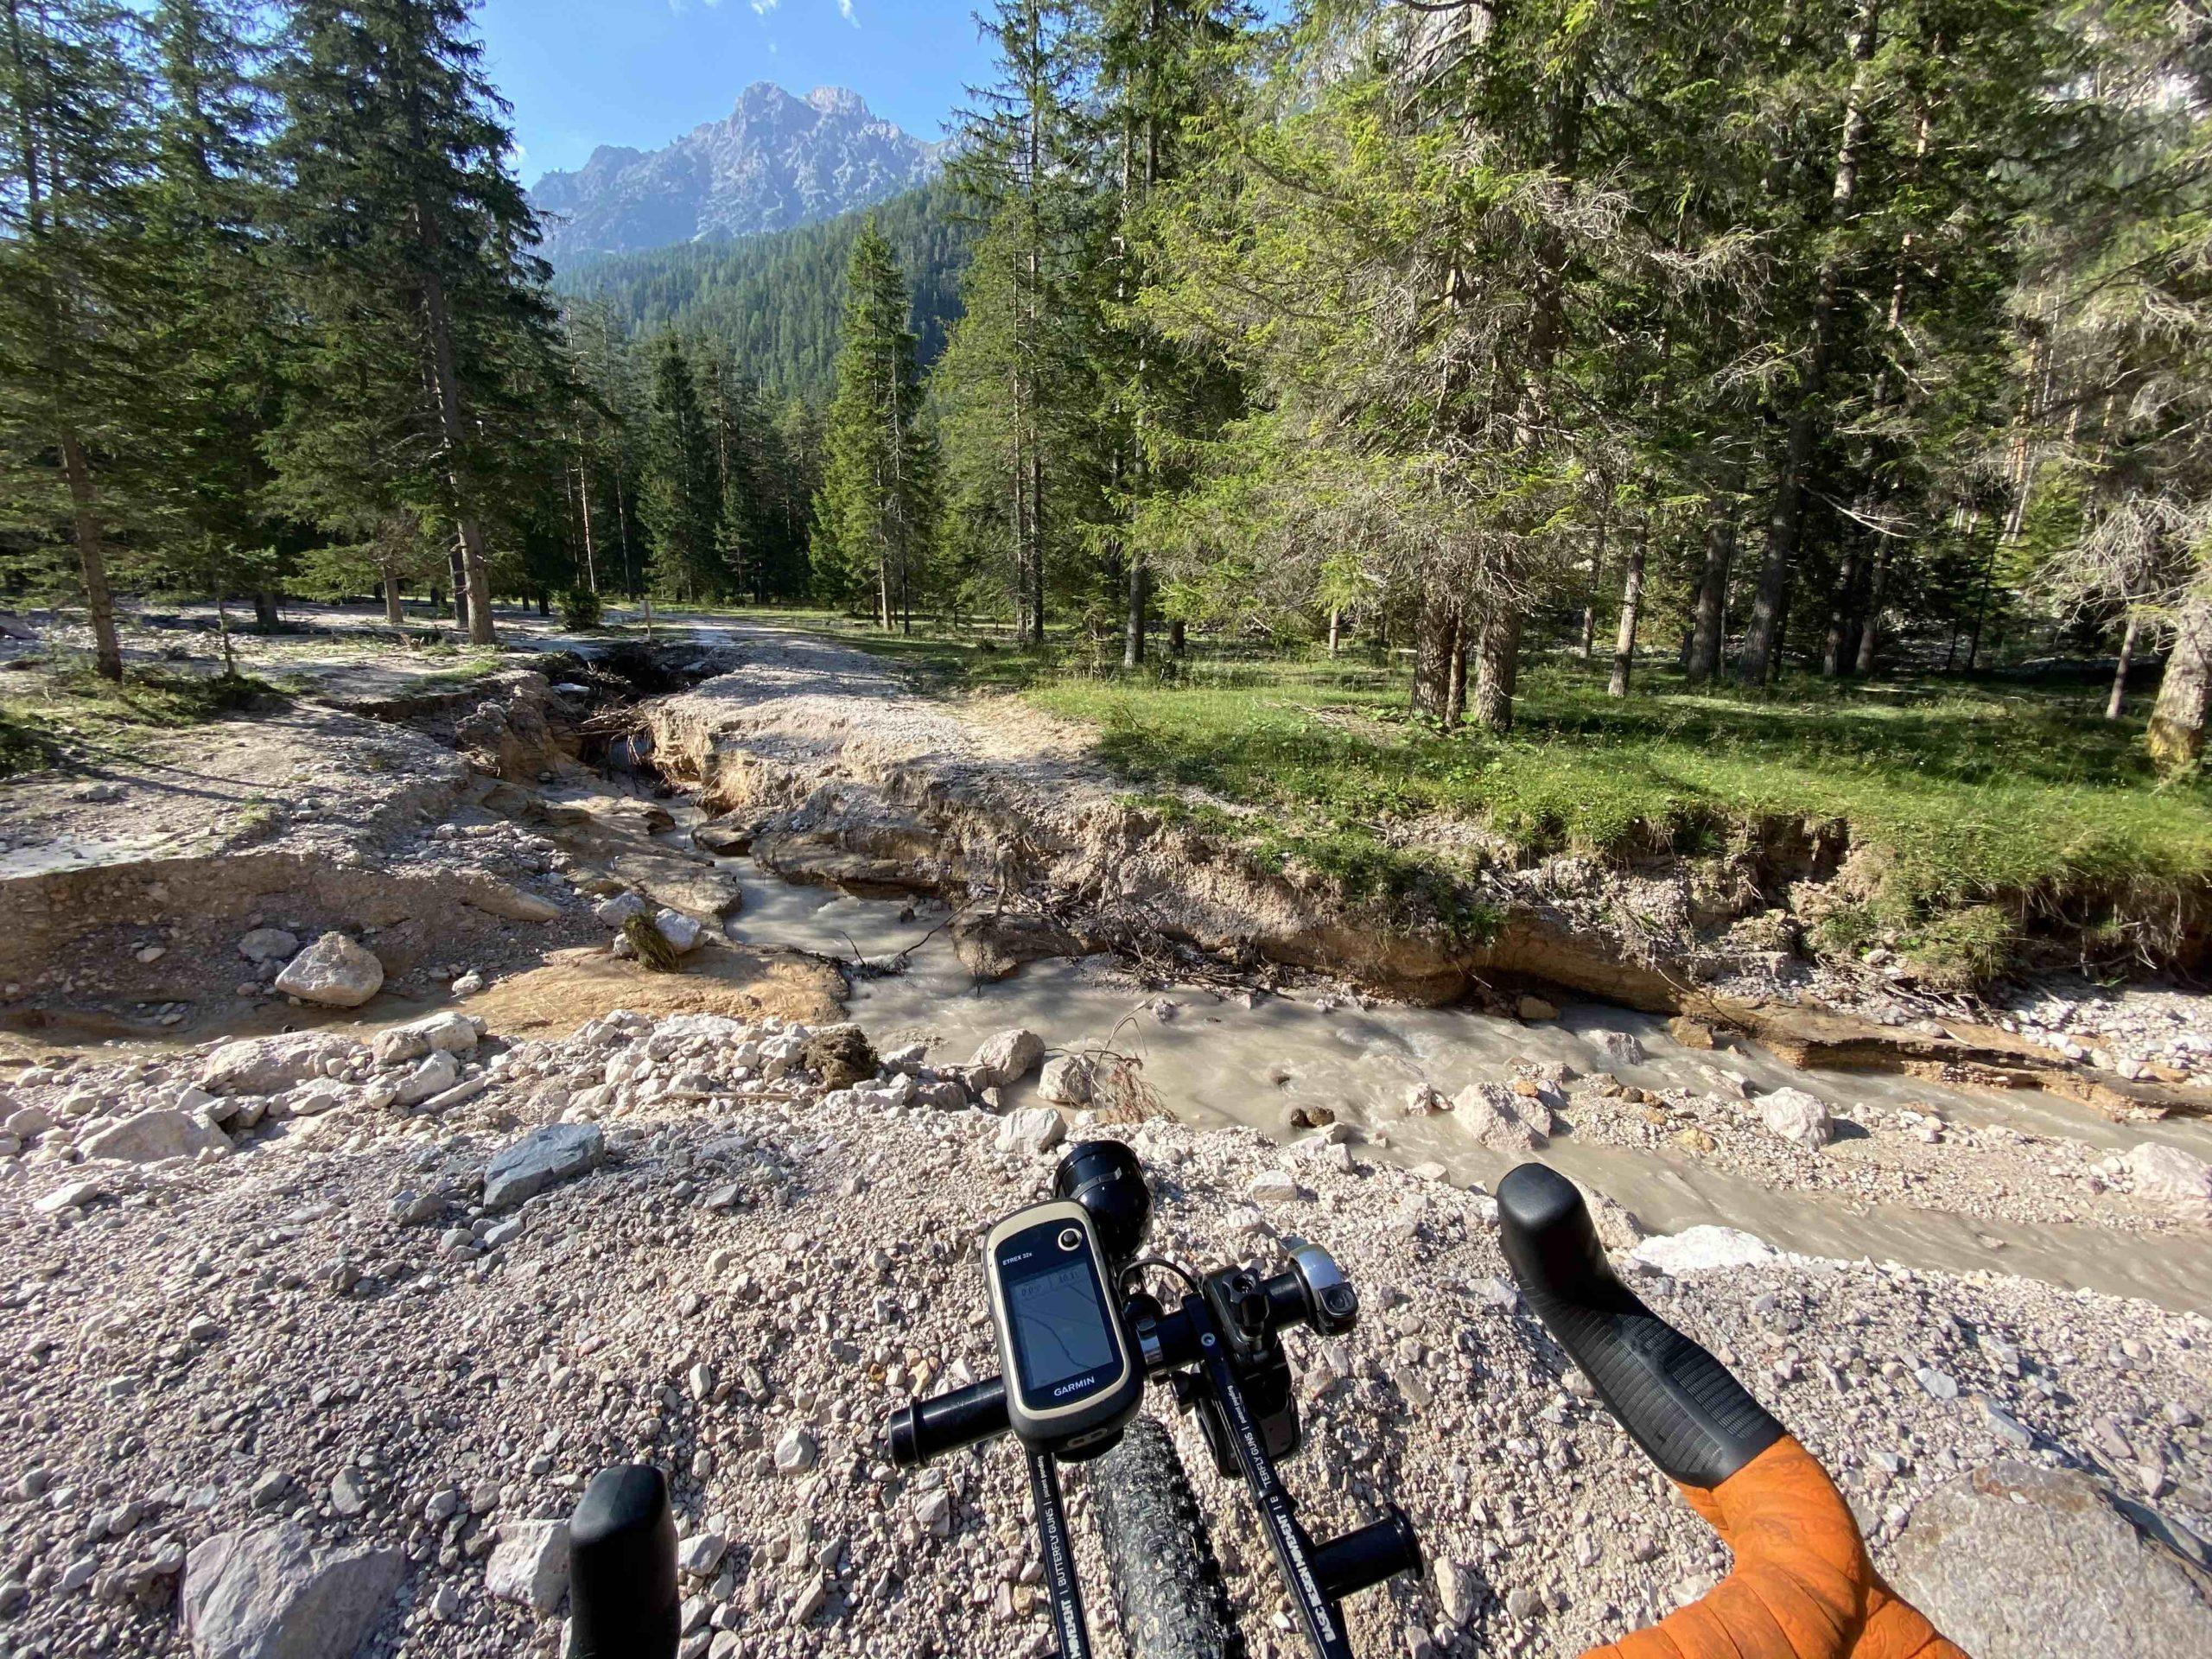 giro del Fanes rifugio Pederu parco naturale fané senese Braies Alto Adige sudtirol visit southtyrol viaggiatore lento dolomiti UNESCO cicloviaggio cicloturismo Alto Adige